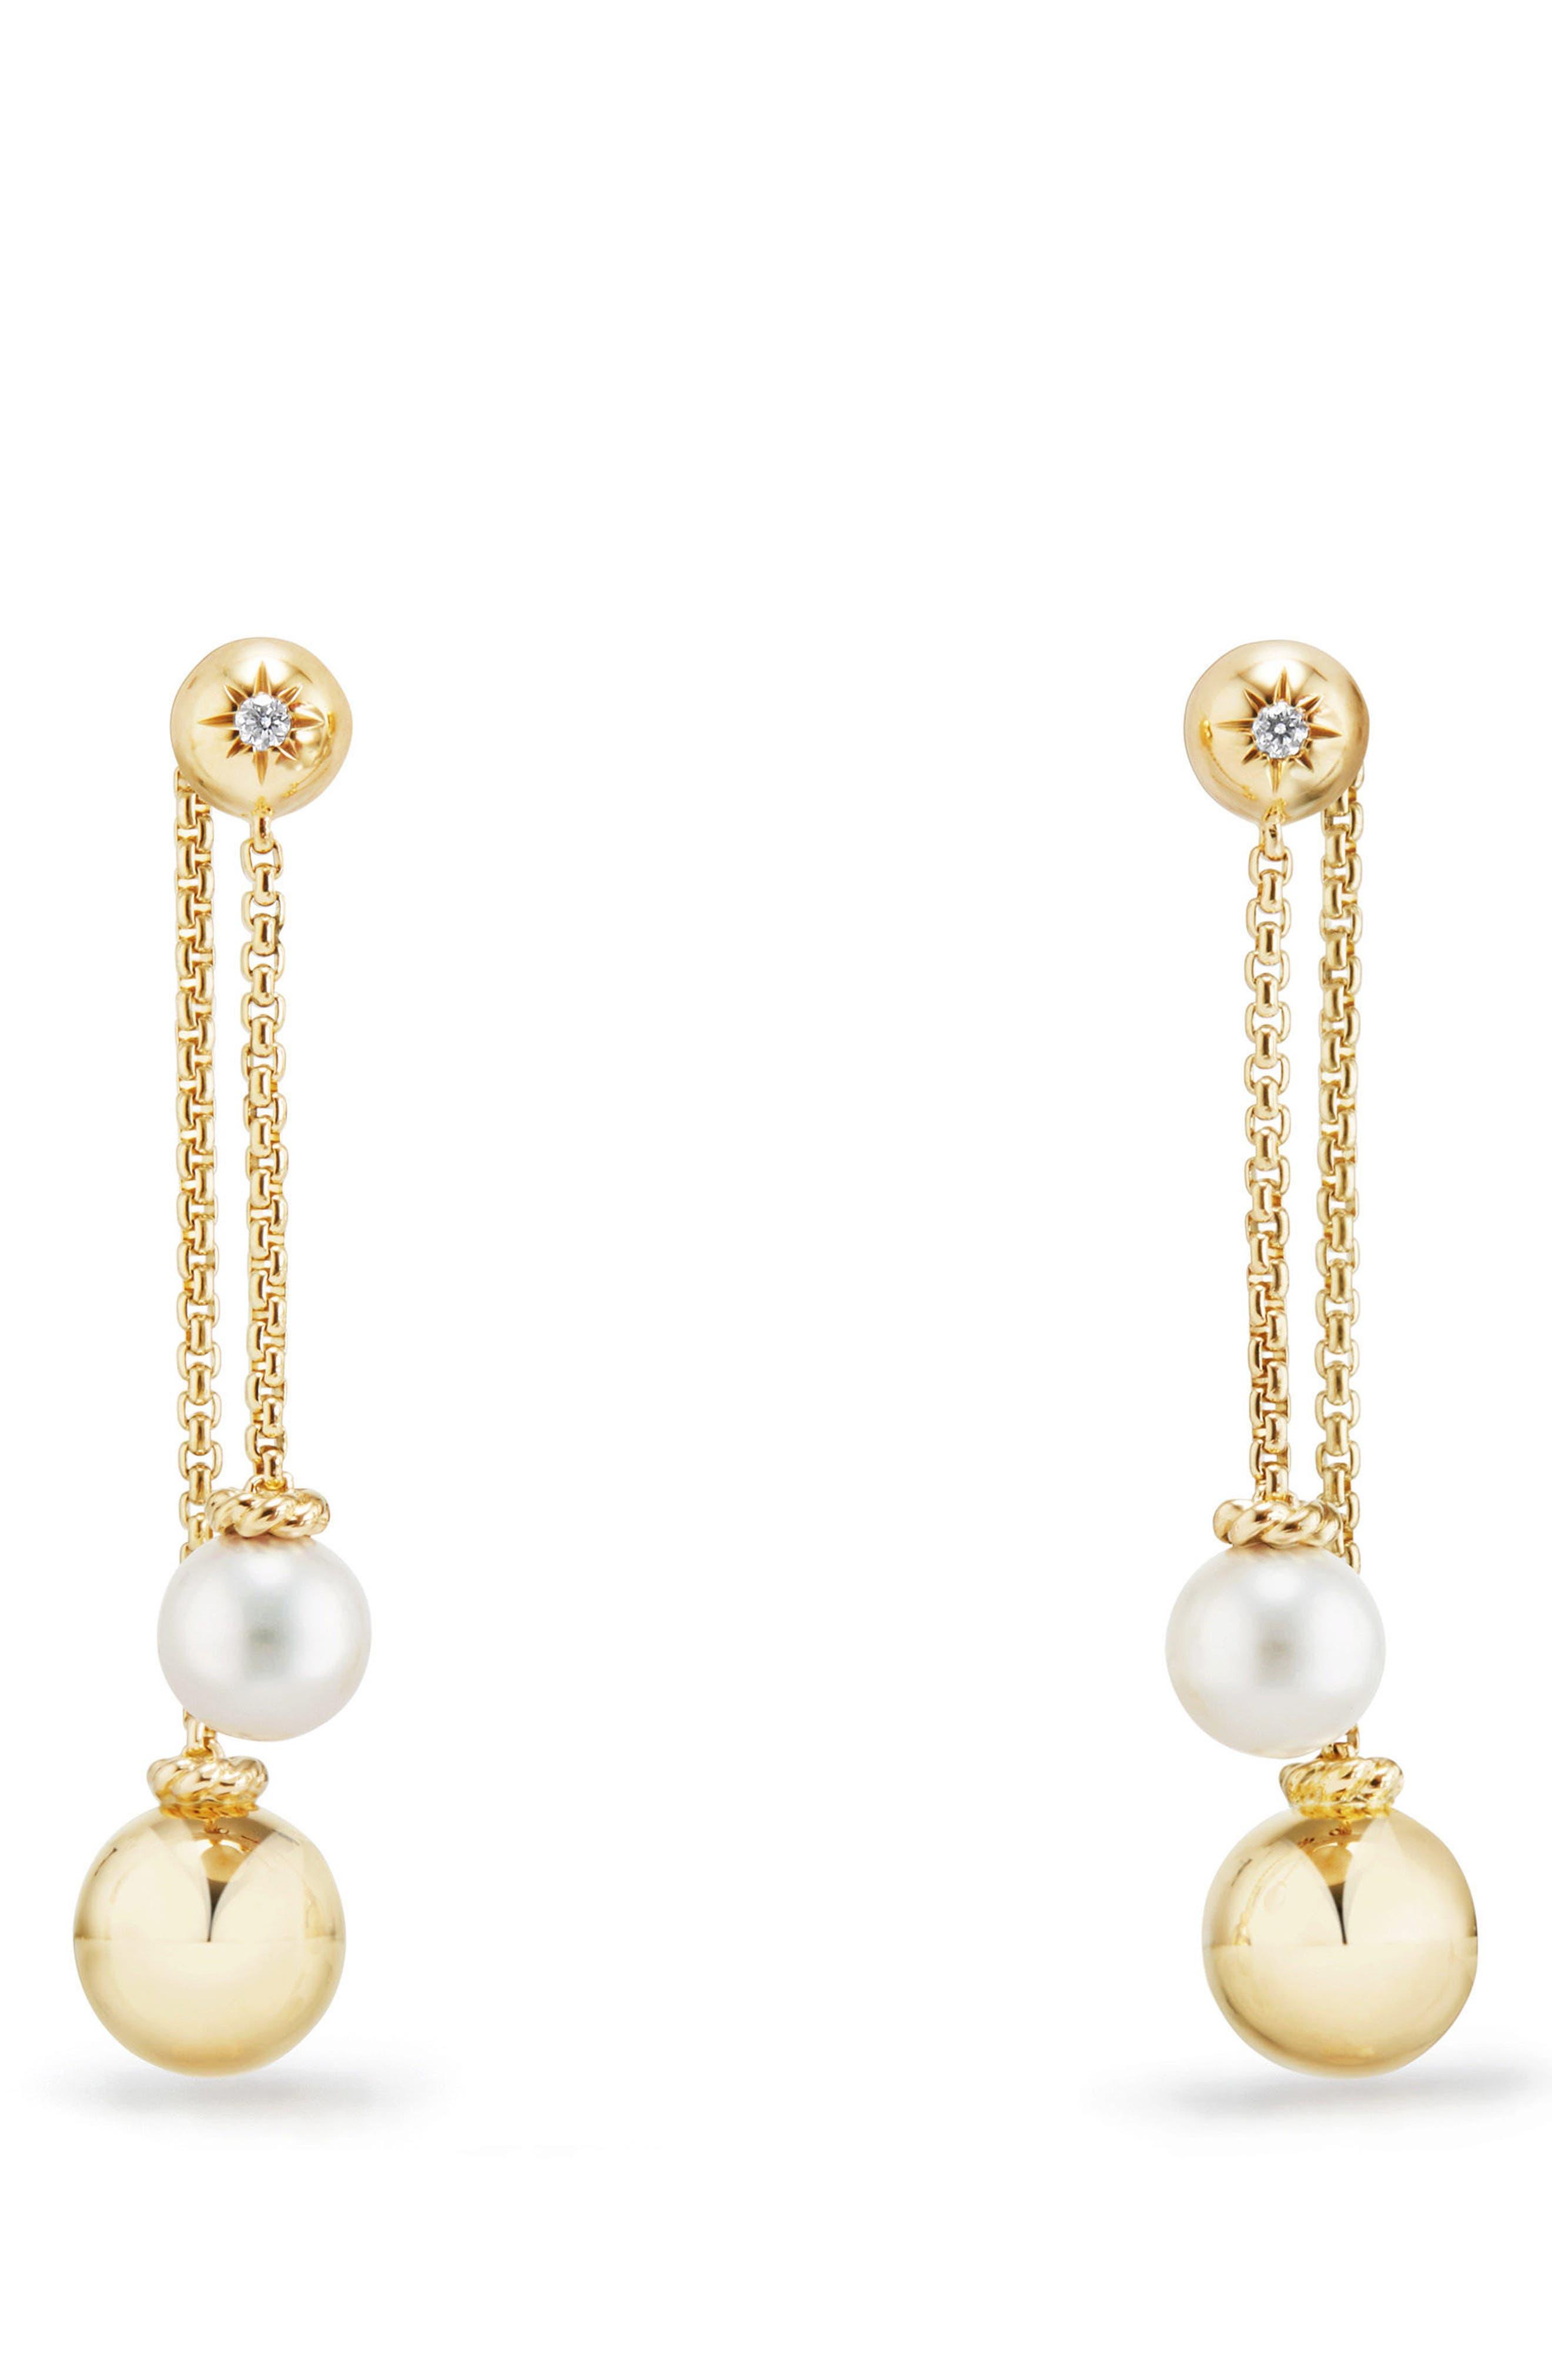 DAVID YURMAN,                             Solari Chain Drop Earrings with Diamonds in 18K Gold,                             Main thumbnail 1, color,                             PEARL